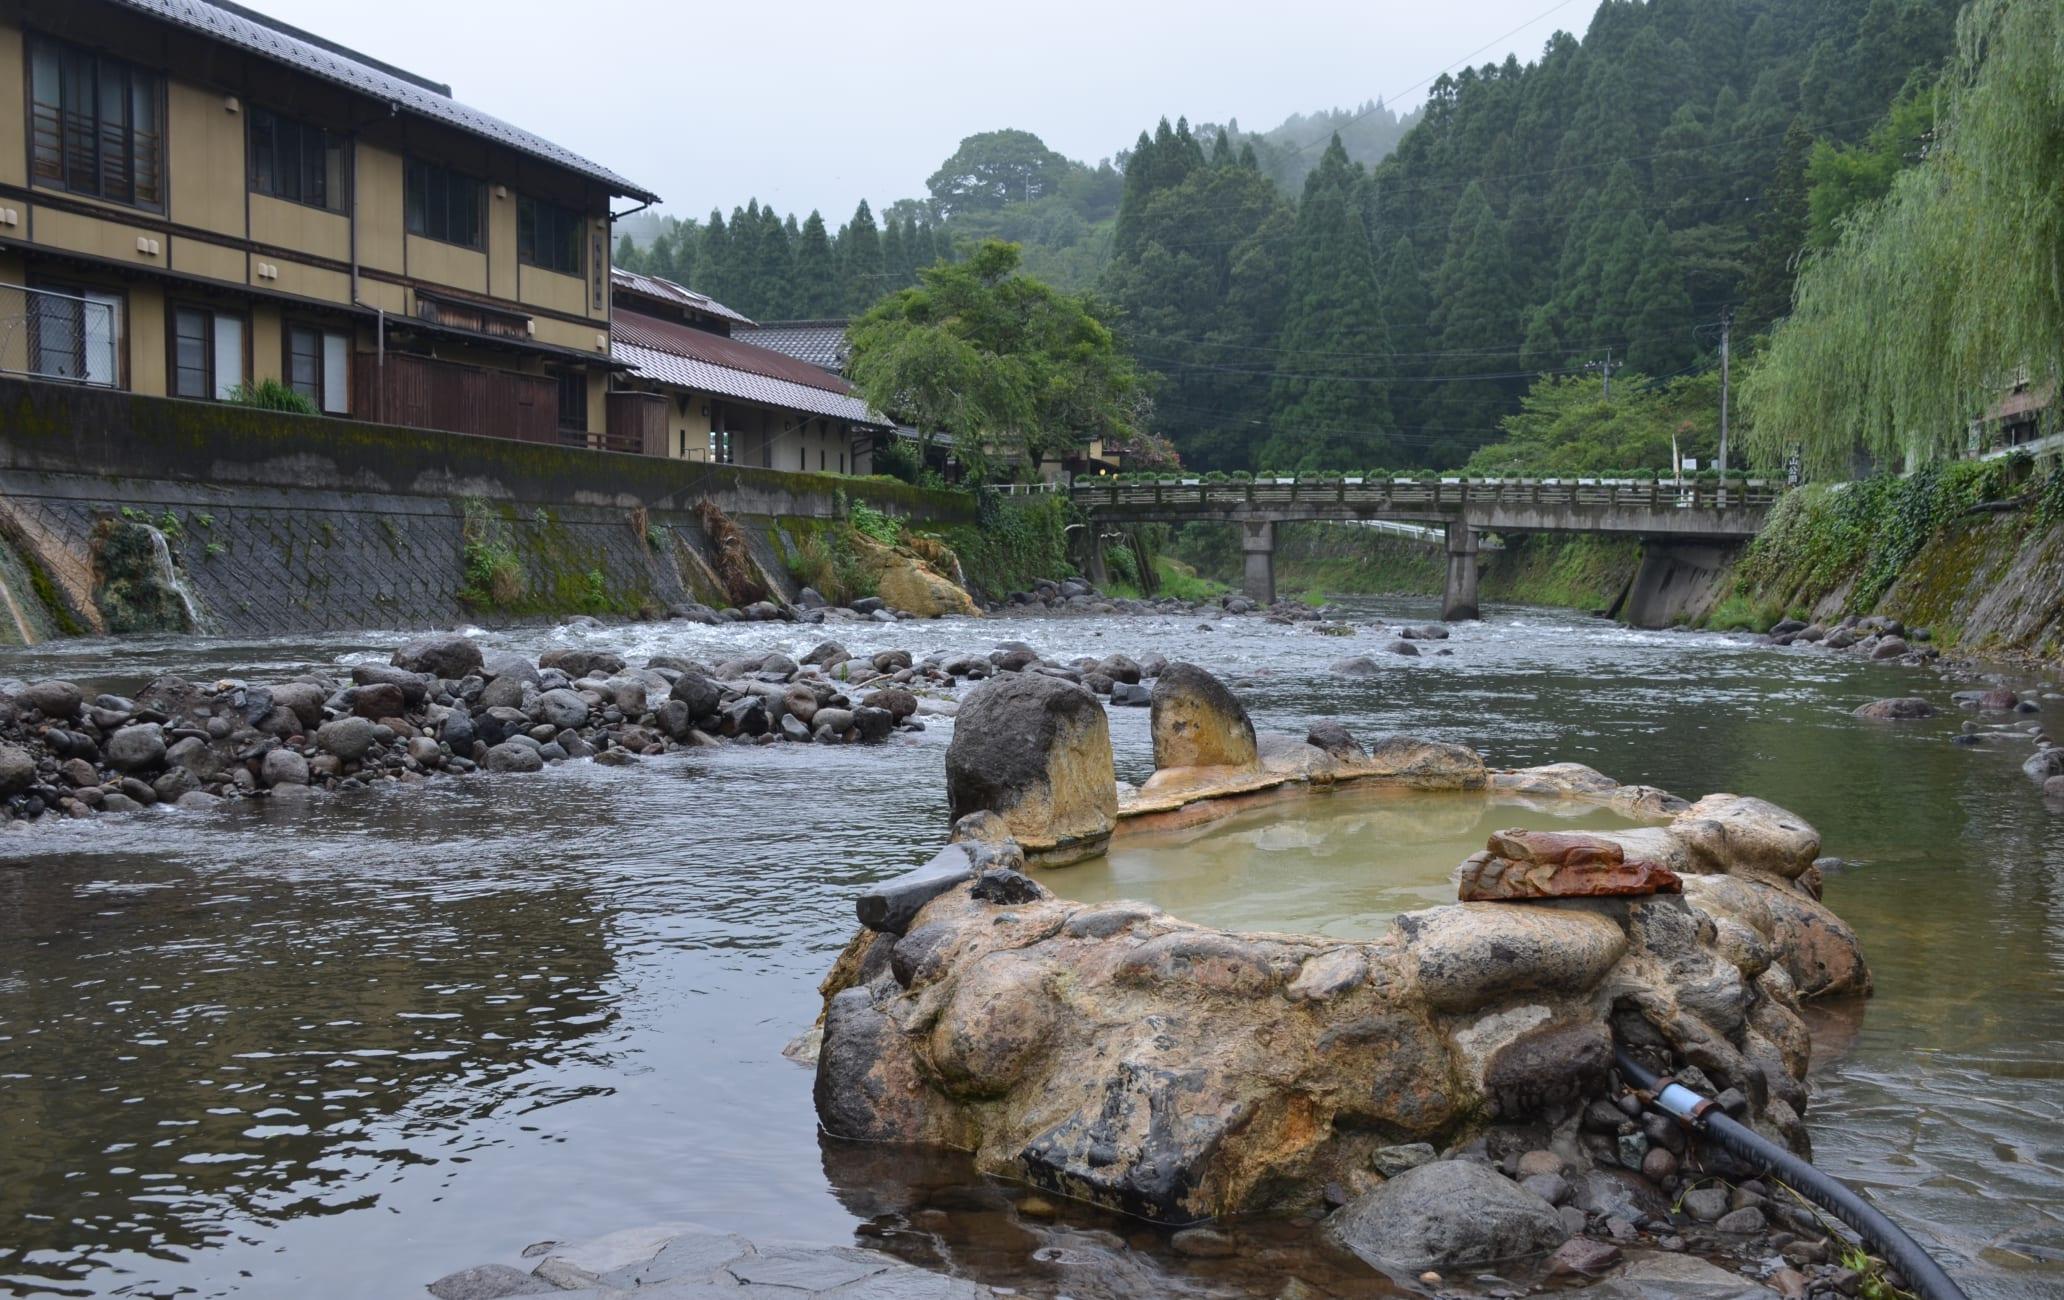 Gozenyu Nagayu Hot Springs Convalescence Culture Center